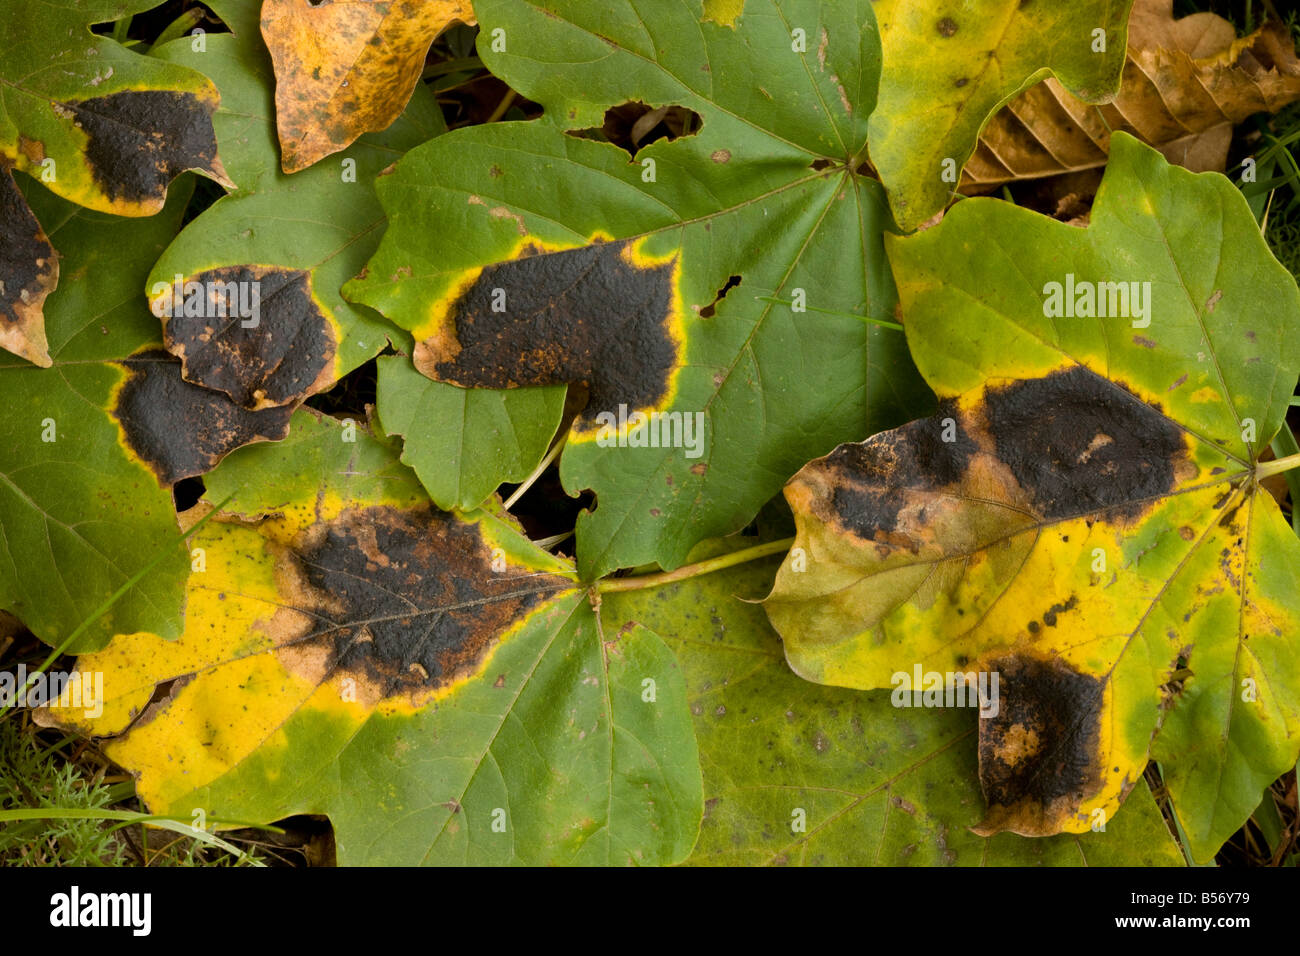 Macchia Di Catrame Fungo Rhytisma Acerinum Su Foglie Di Acero